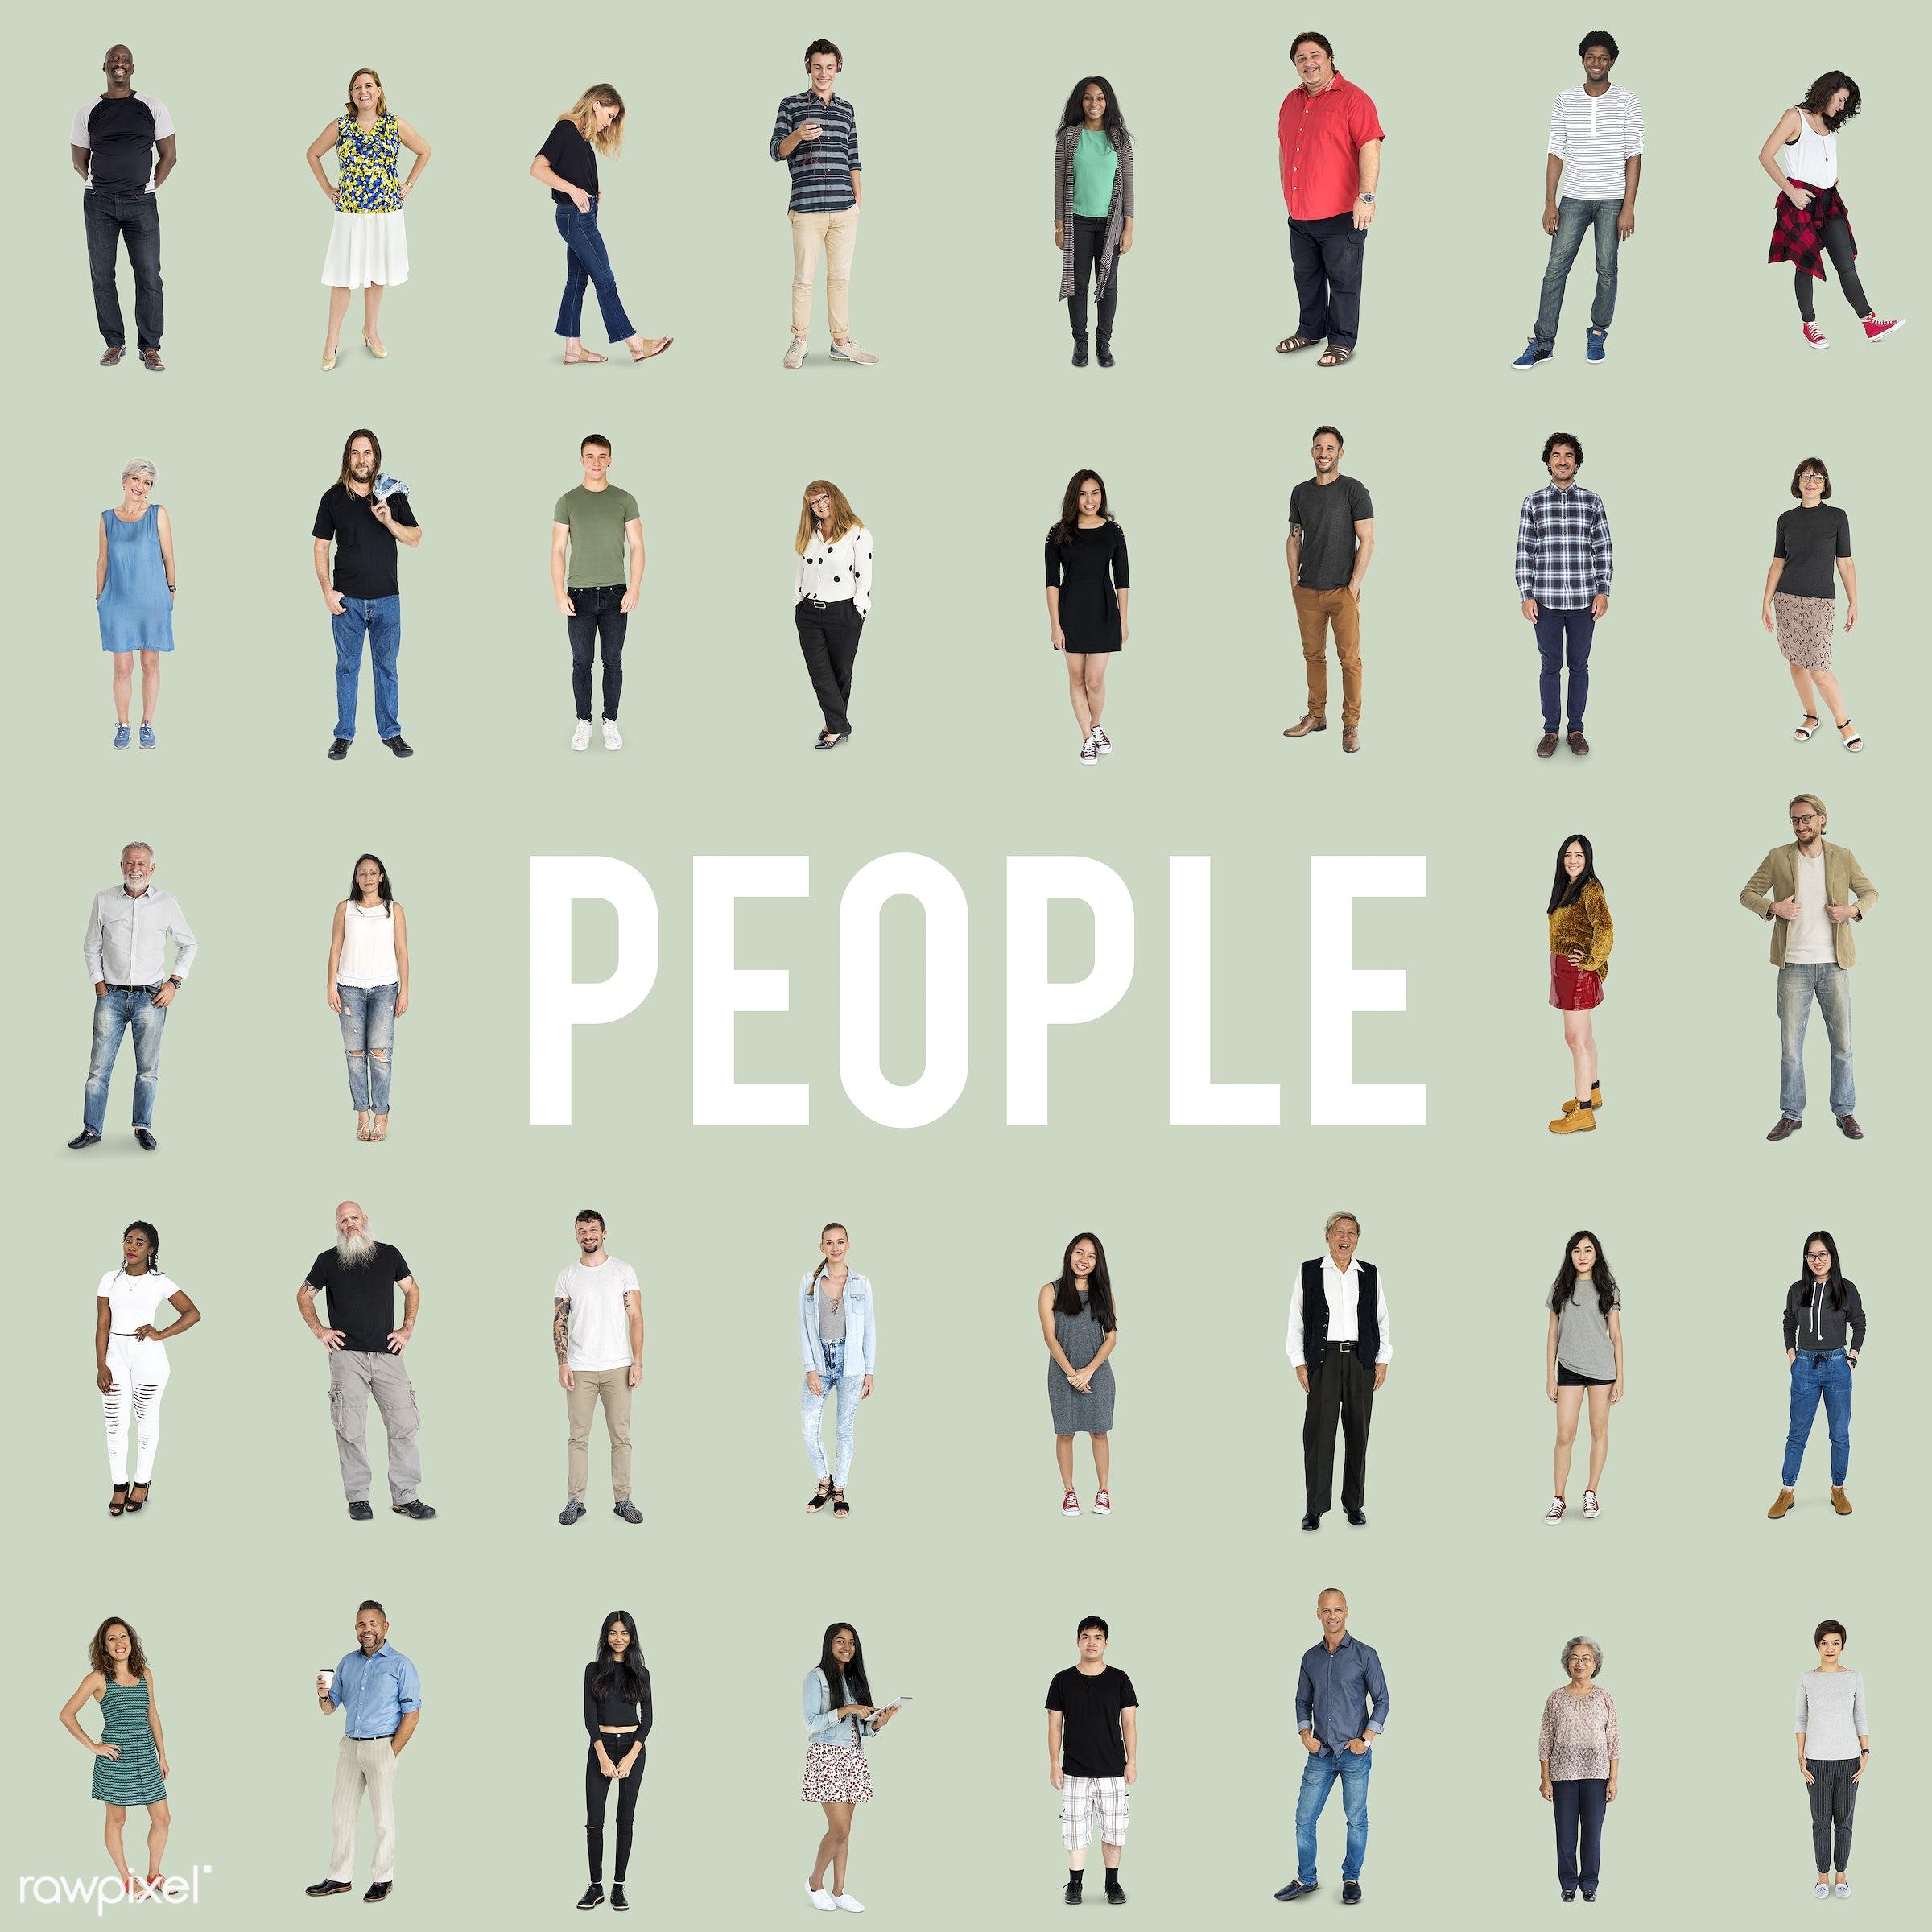 gentlemen, studio, person, diverse, personality, people, race, attraction, caucasian, asian, retirement, woman, lifestyle,...